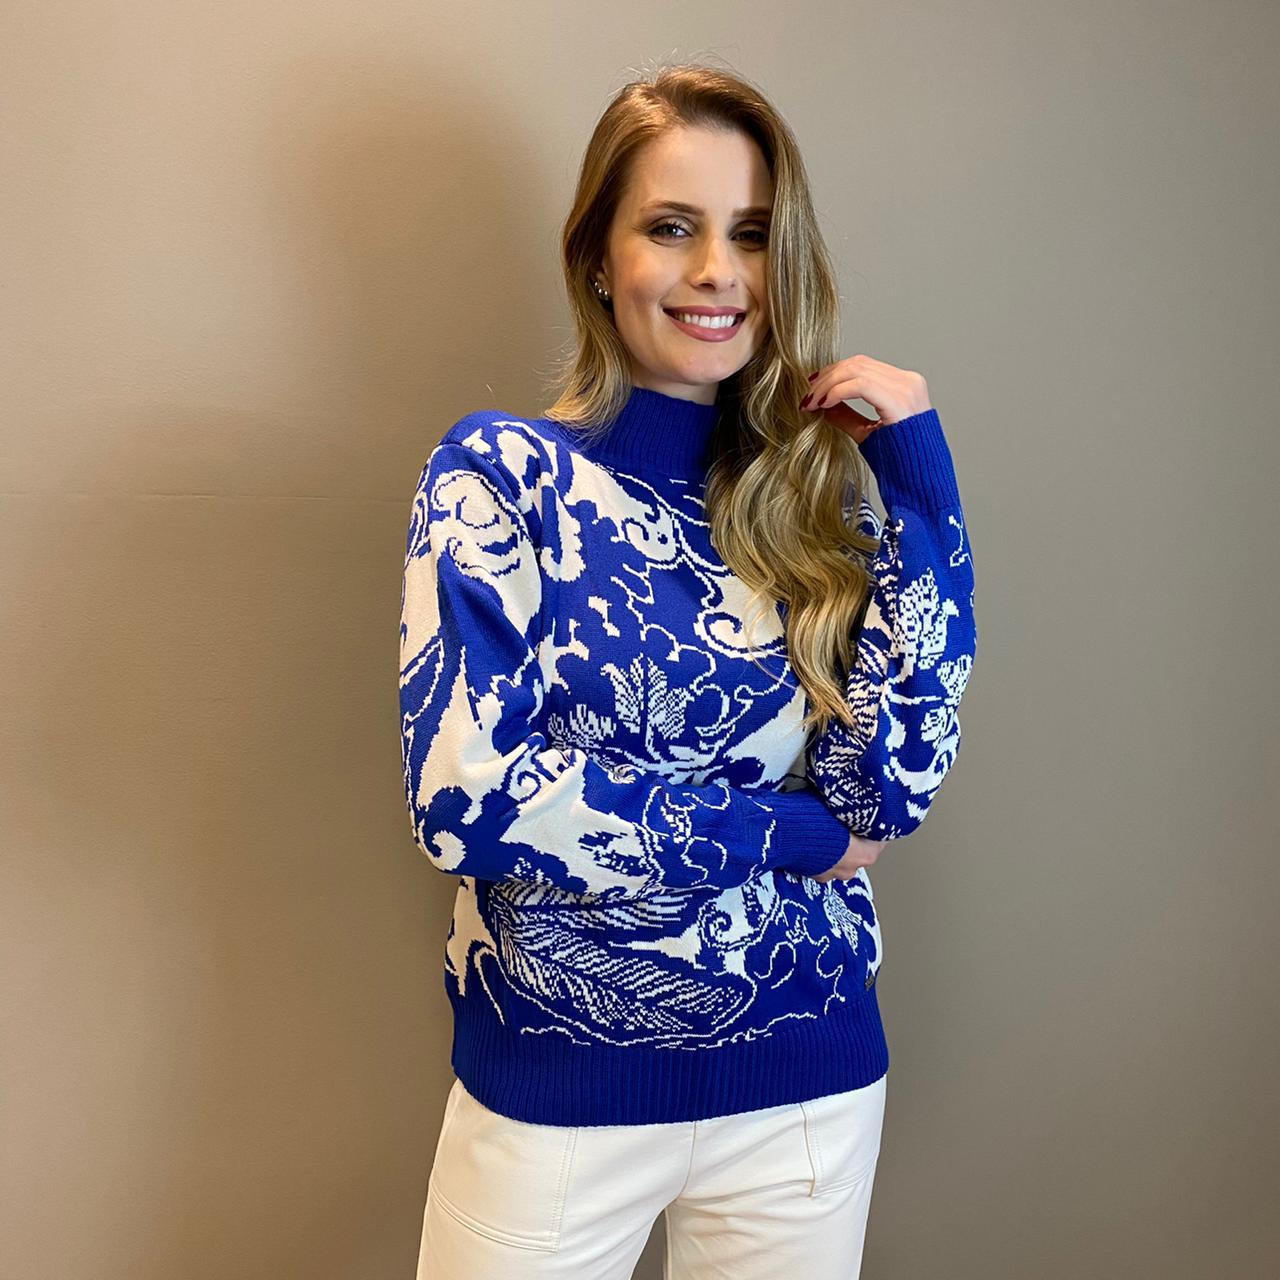 Blusa tricot Trancoso Jacquard Azul -